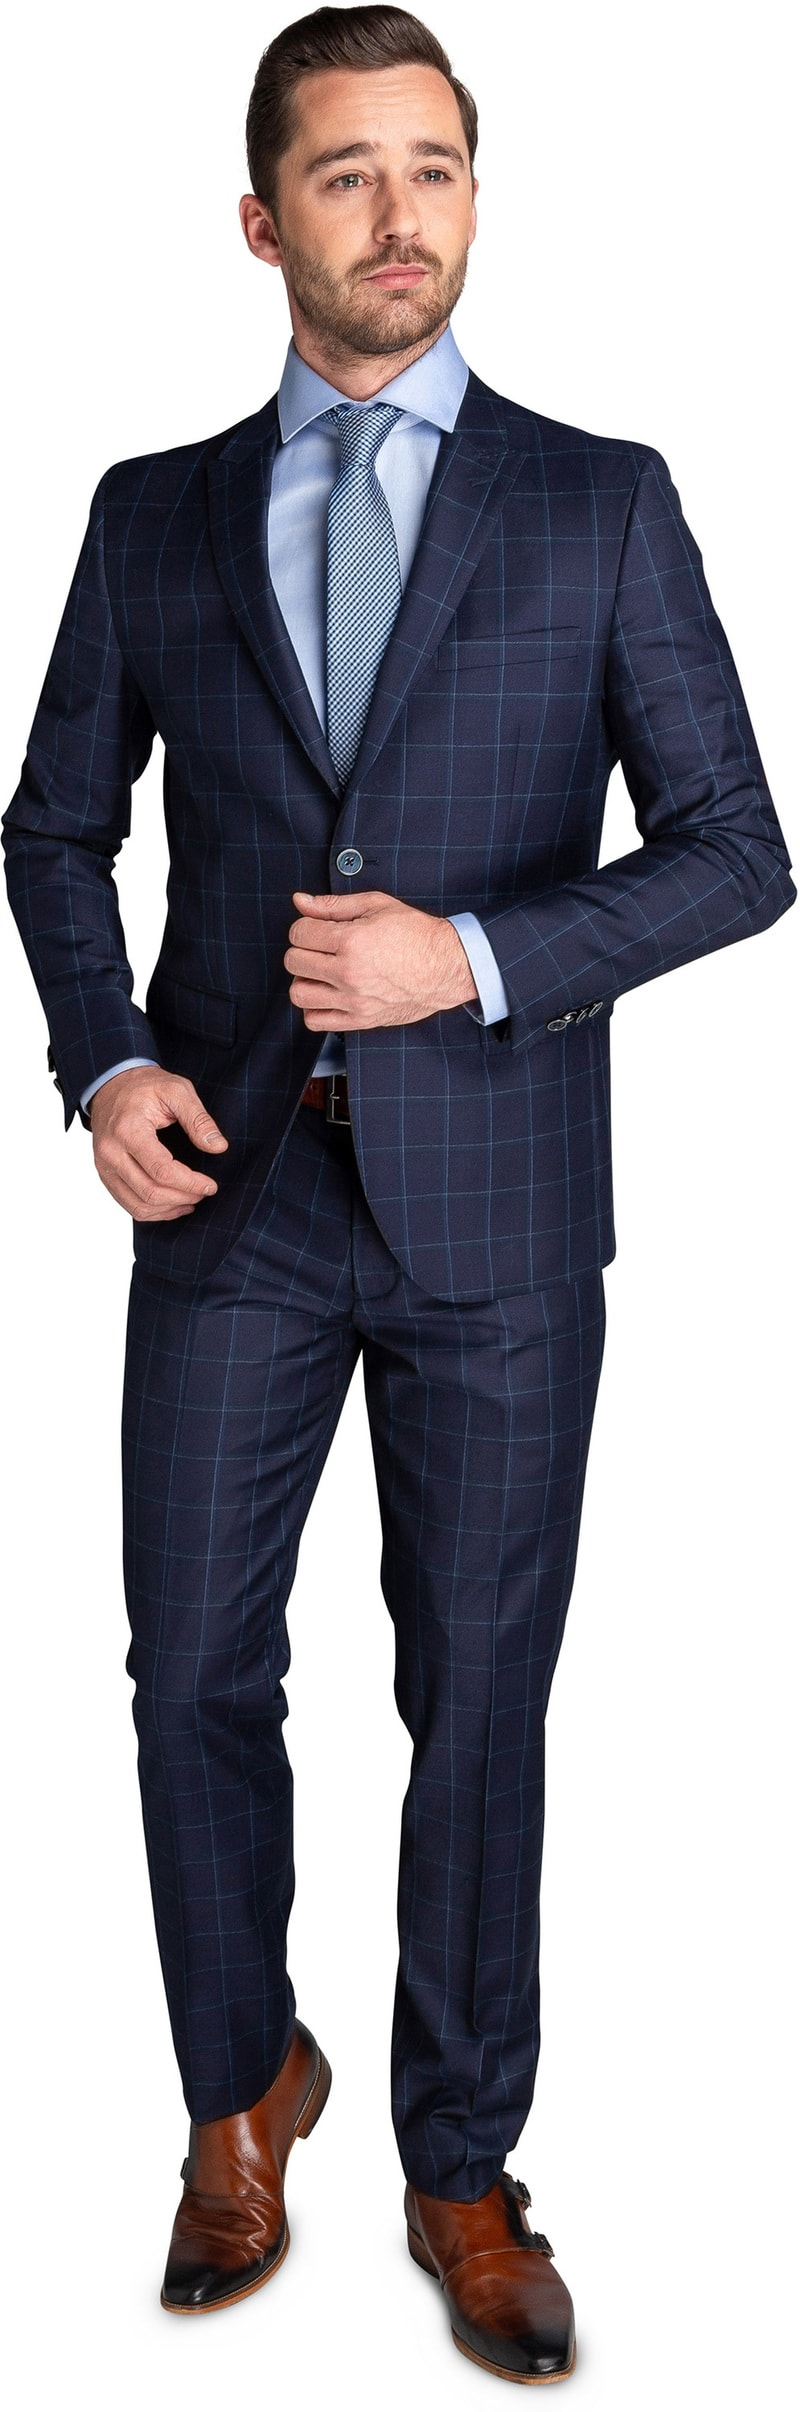 Suitable Suit Strato Windowpane Navy